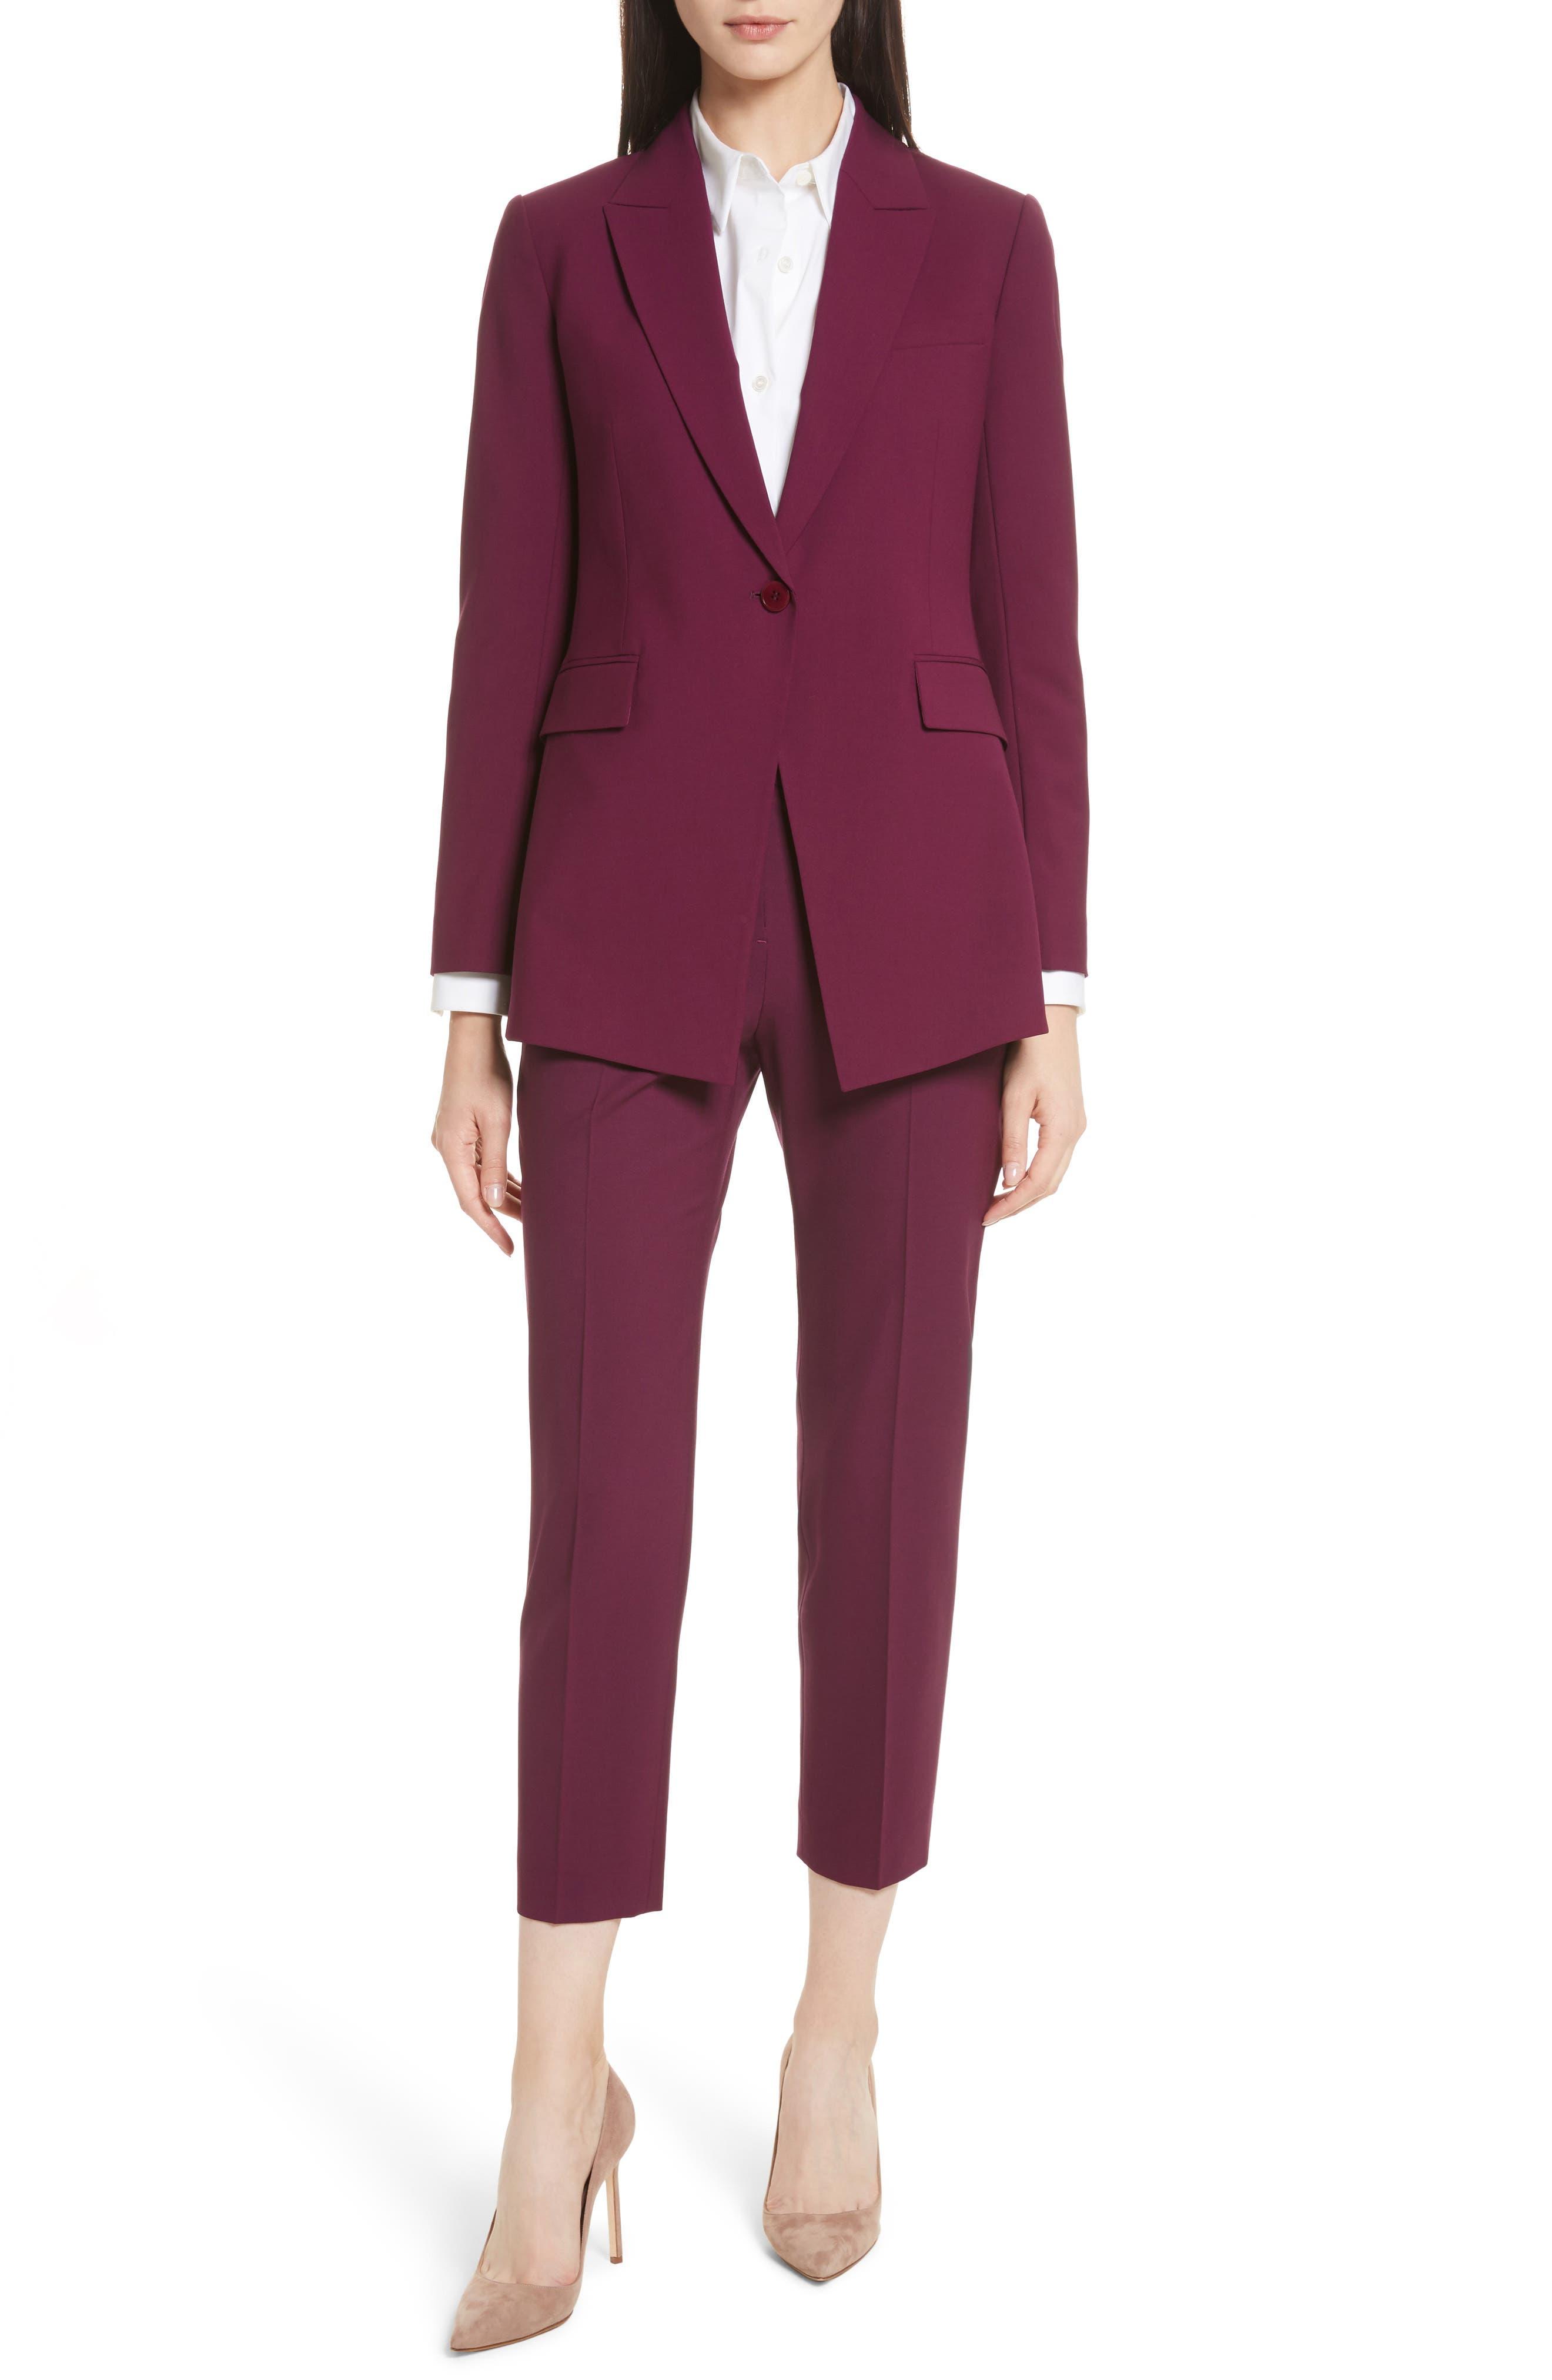 Etienette B Good Wool Suit Jacket,                             Alternate thumbnail 49, color,